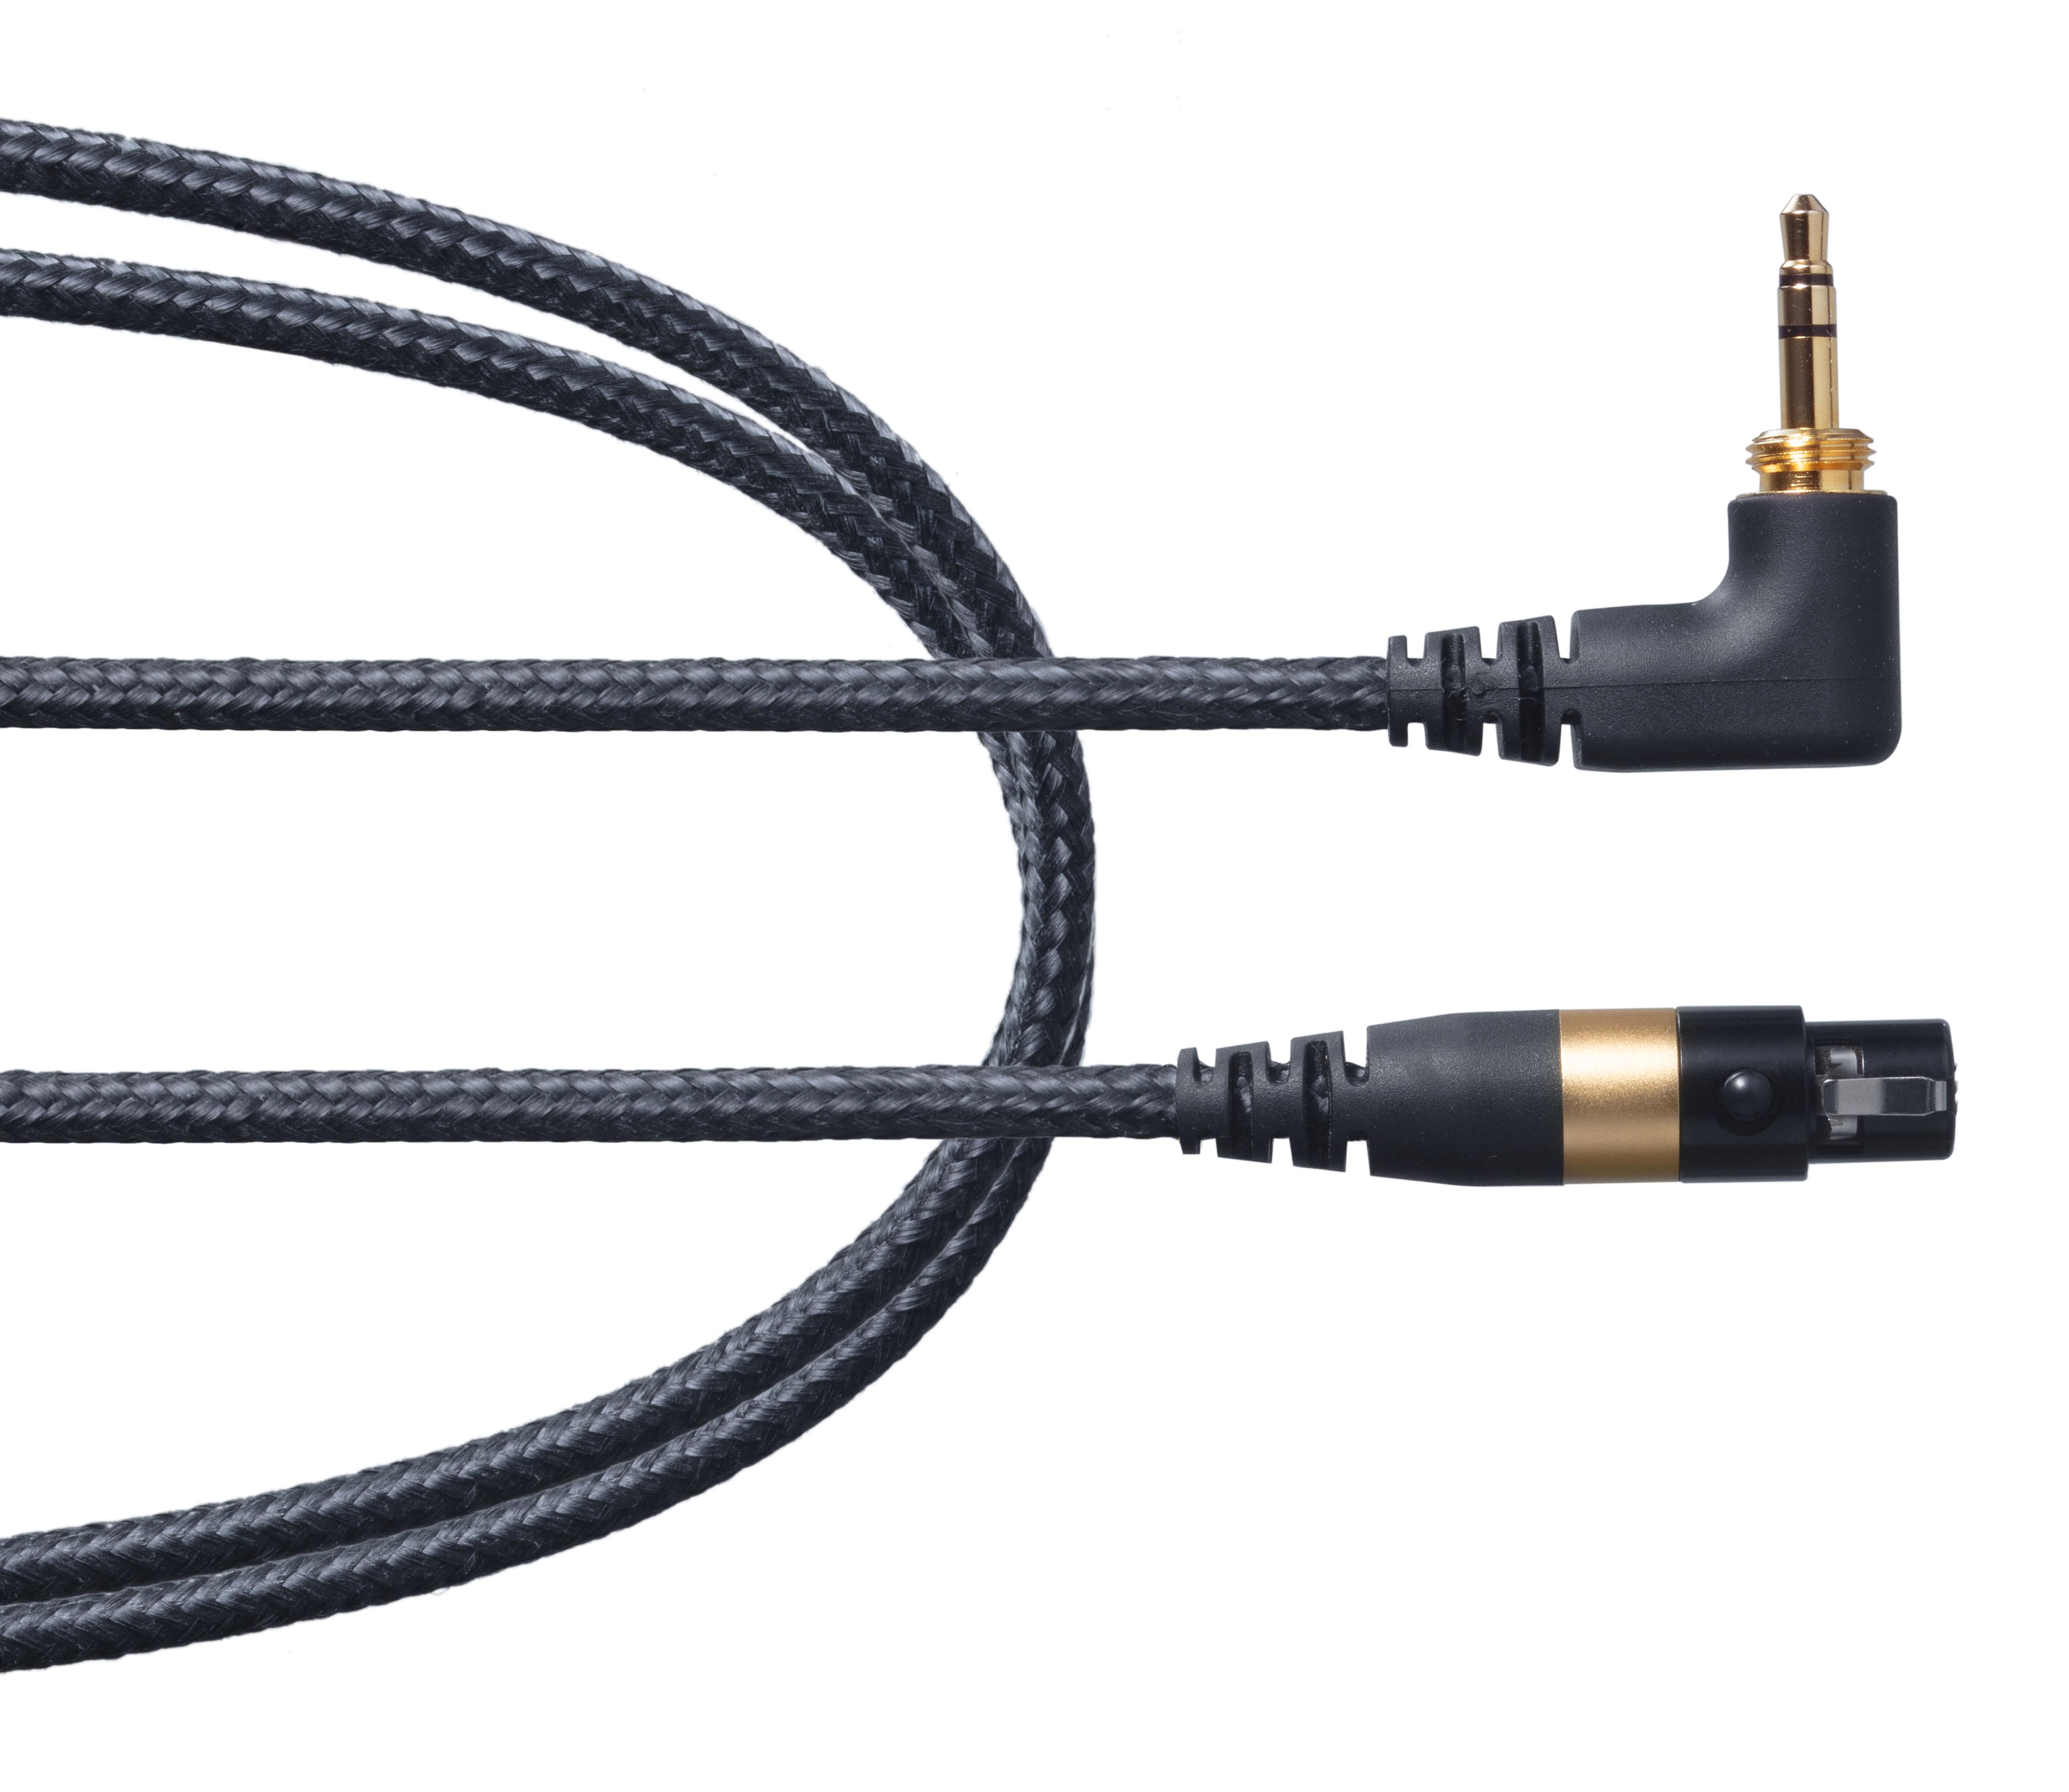 HDJ-X10C-improved-durability-2